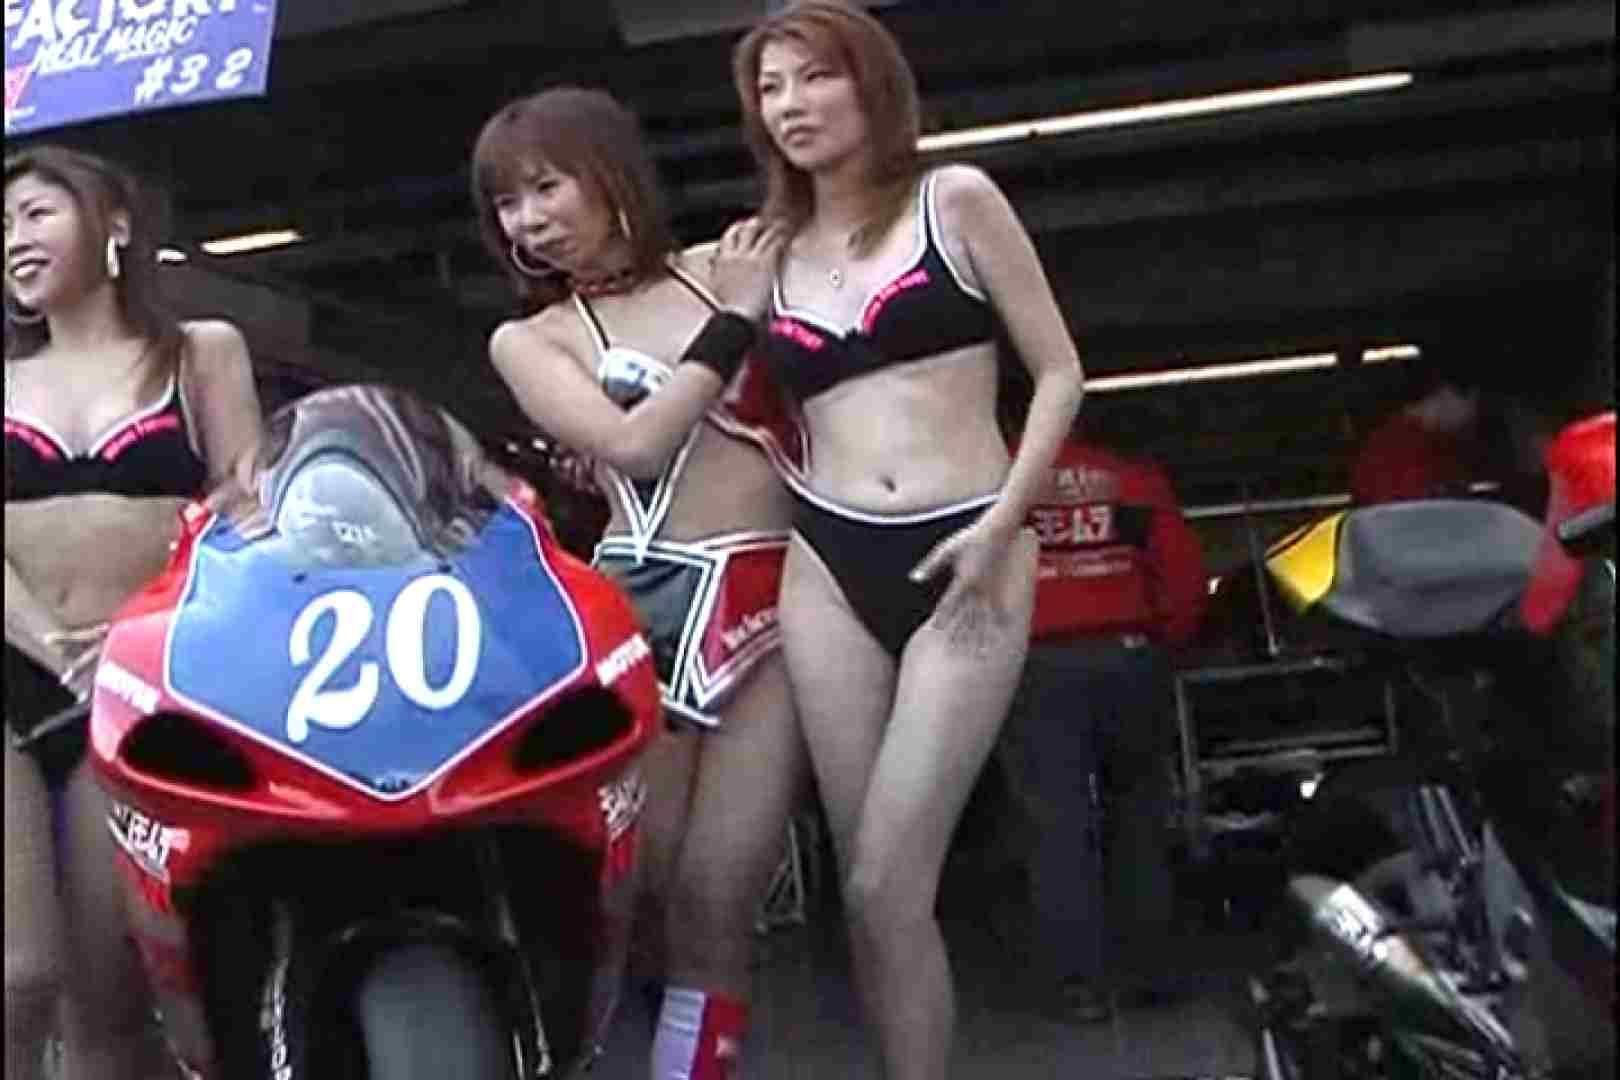 RQカメラ地獄Vol.12 OL女体 | スケベ  67連発 40